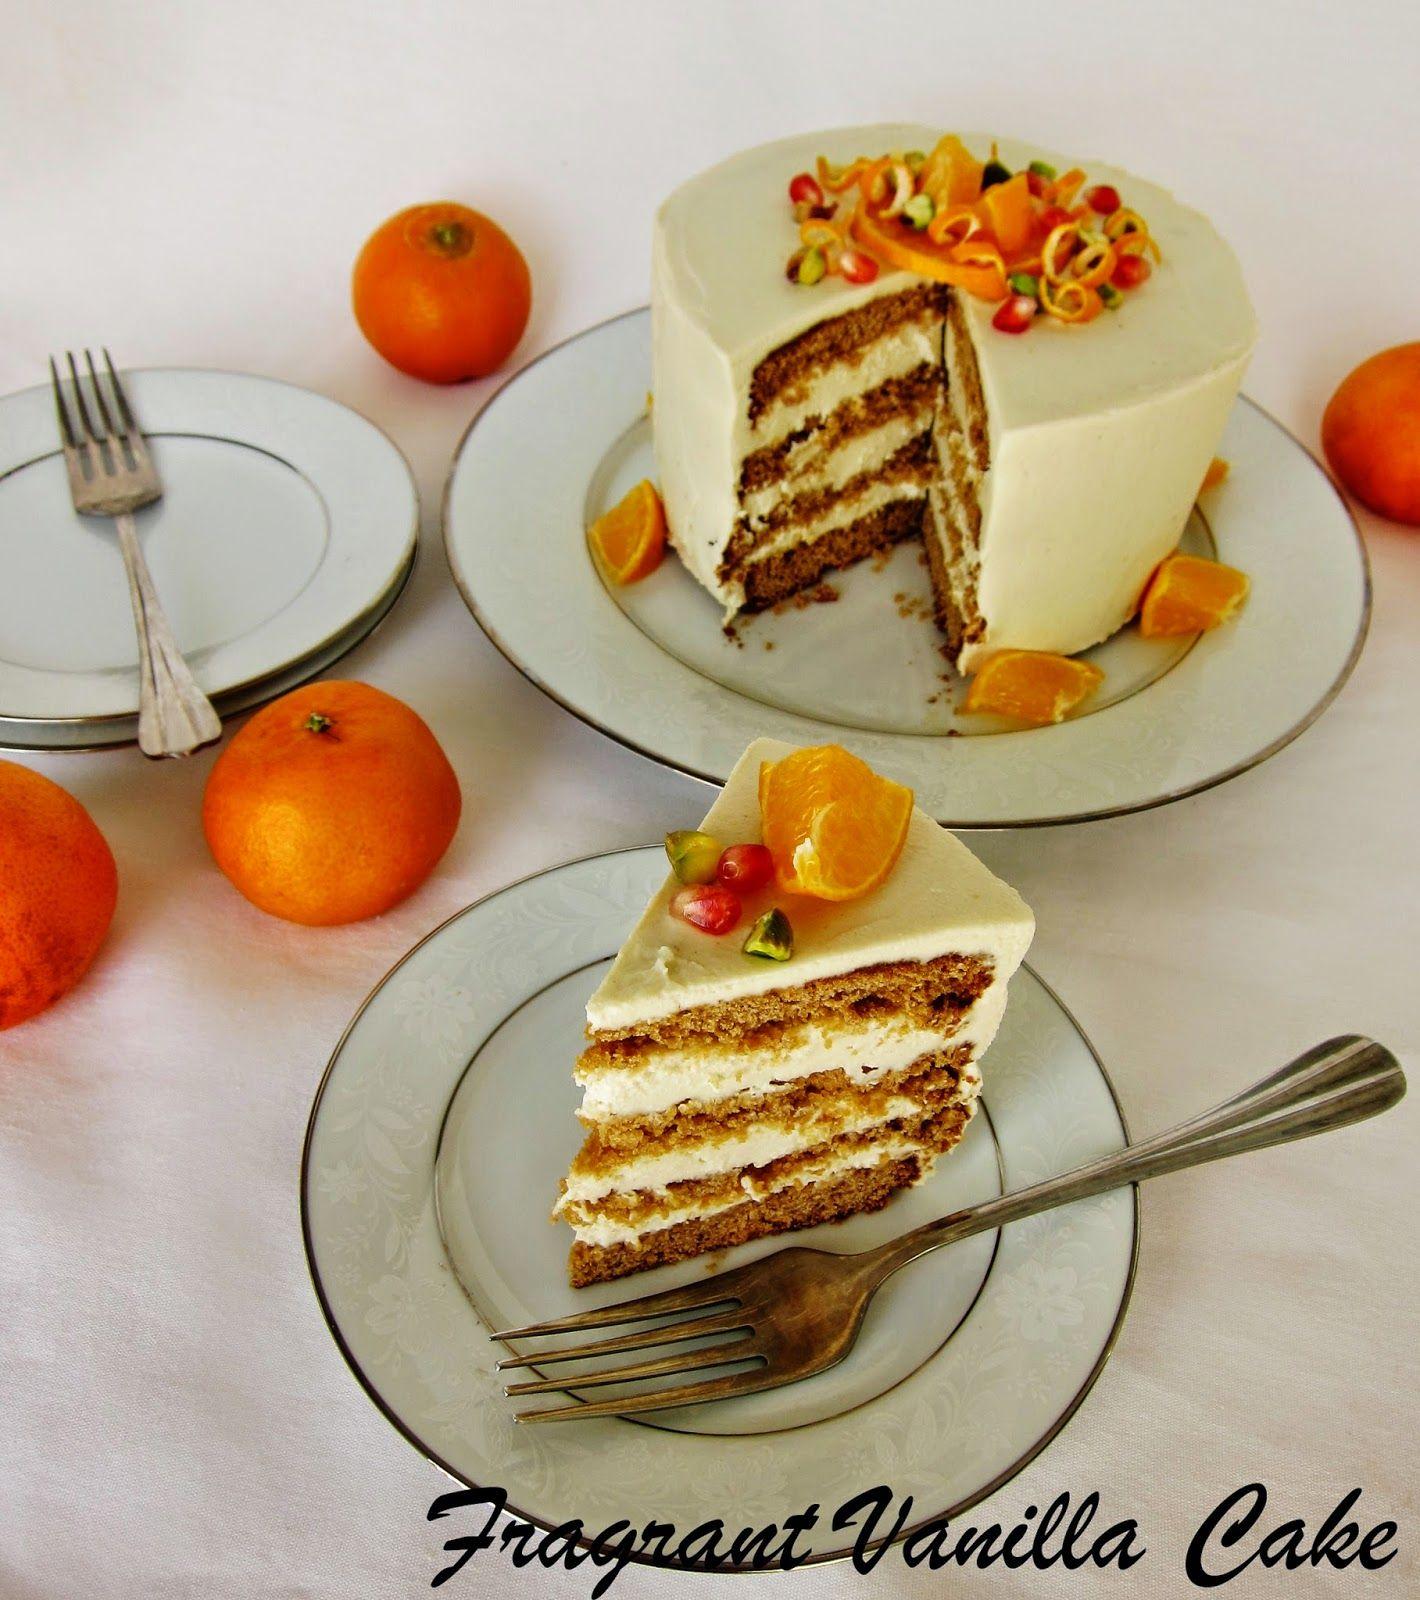 Fragrant Vanilla Cake Vegan Orange Blossom Layer Cake Vegan Sweets Dessert Recipes Just Desserts